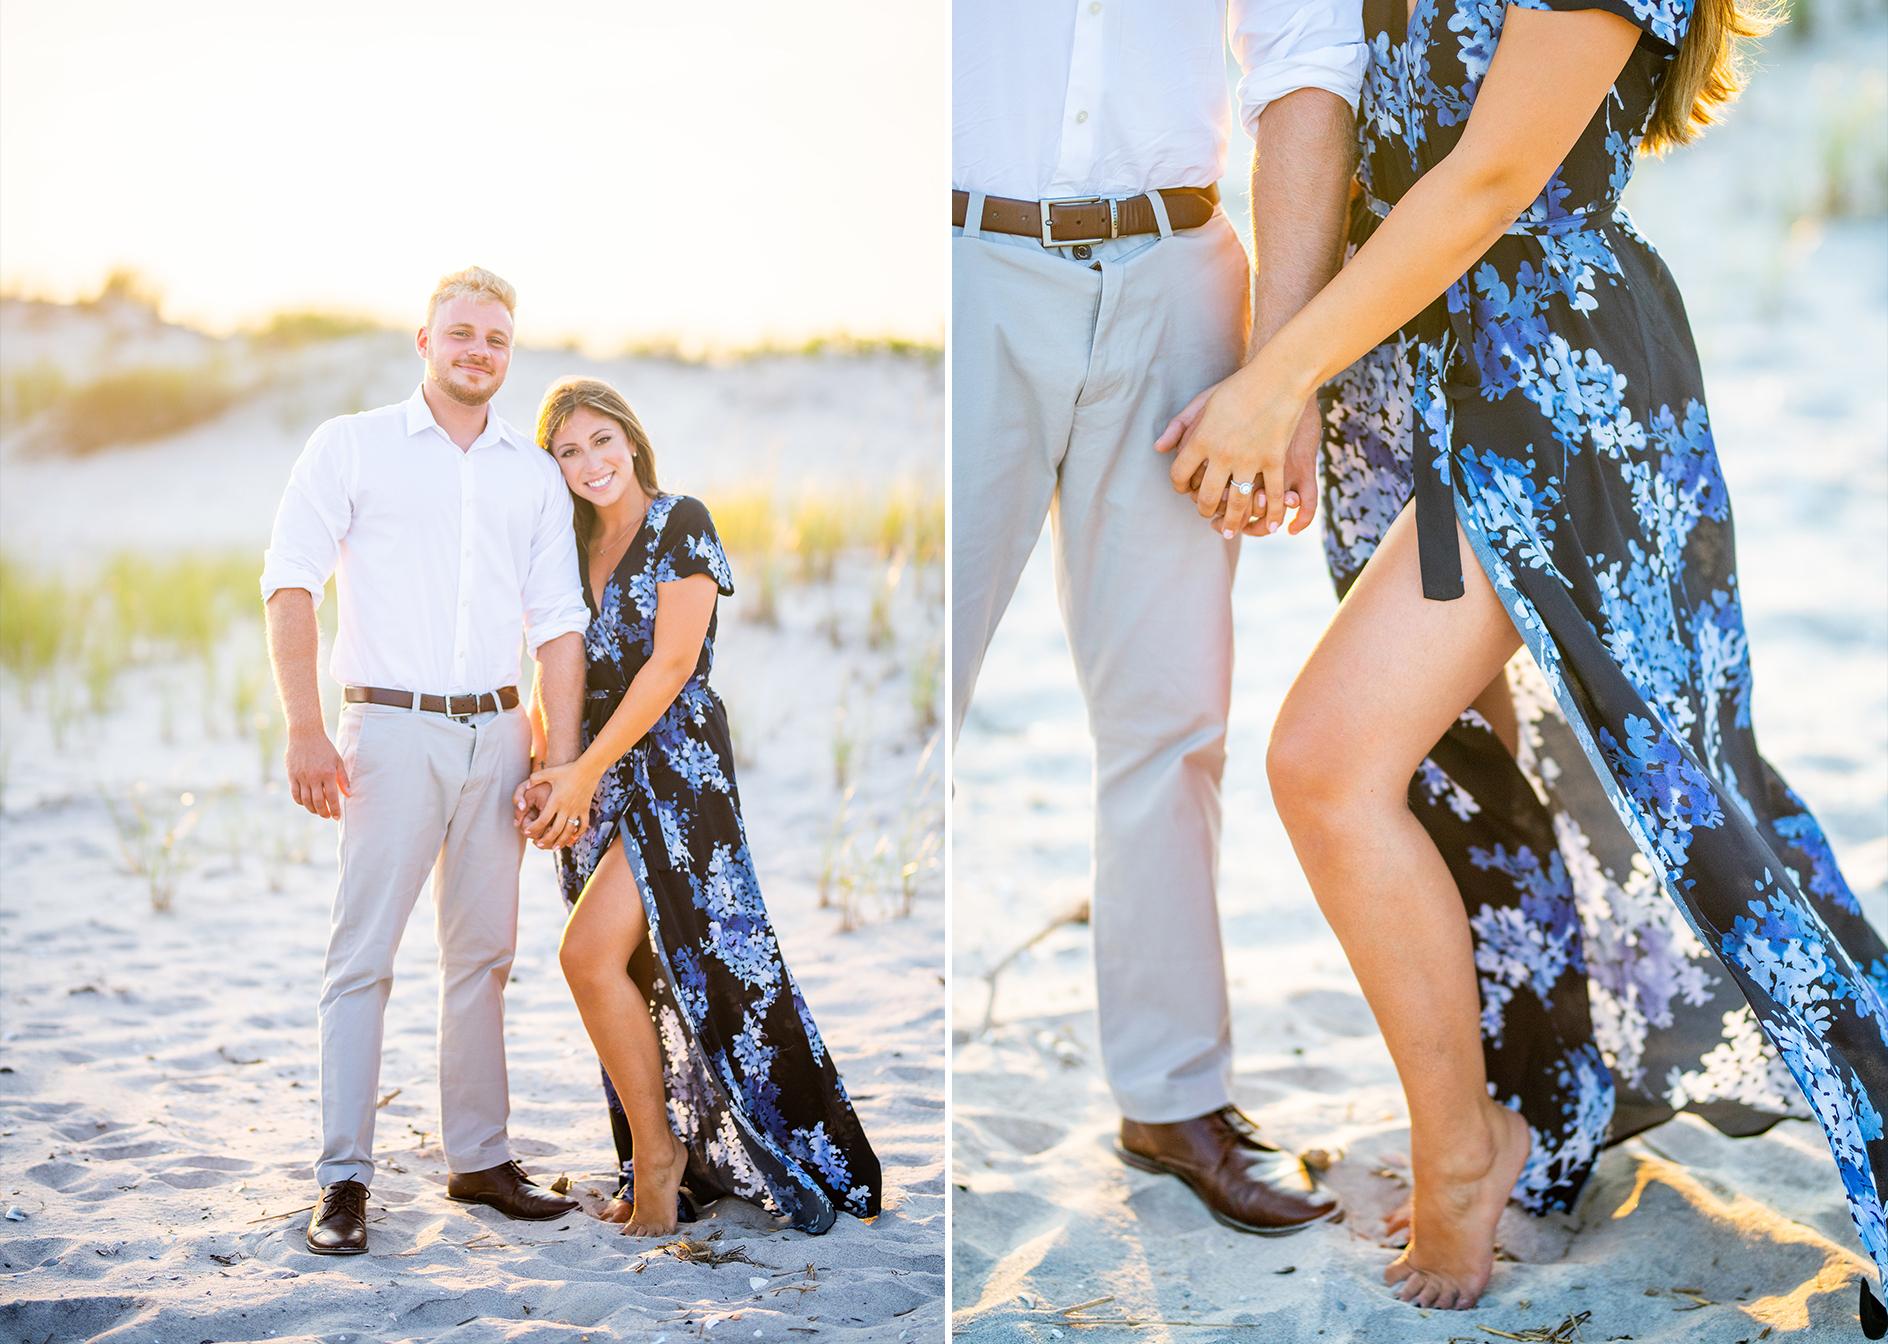 Dune Road Engagement Shoot | Westhampton Beach Engagement Shoot | Hamptons Wedding Photographer5